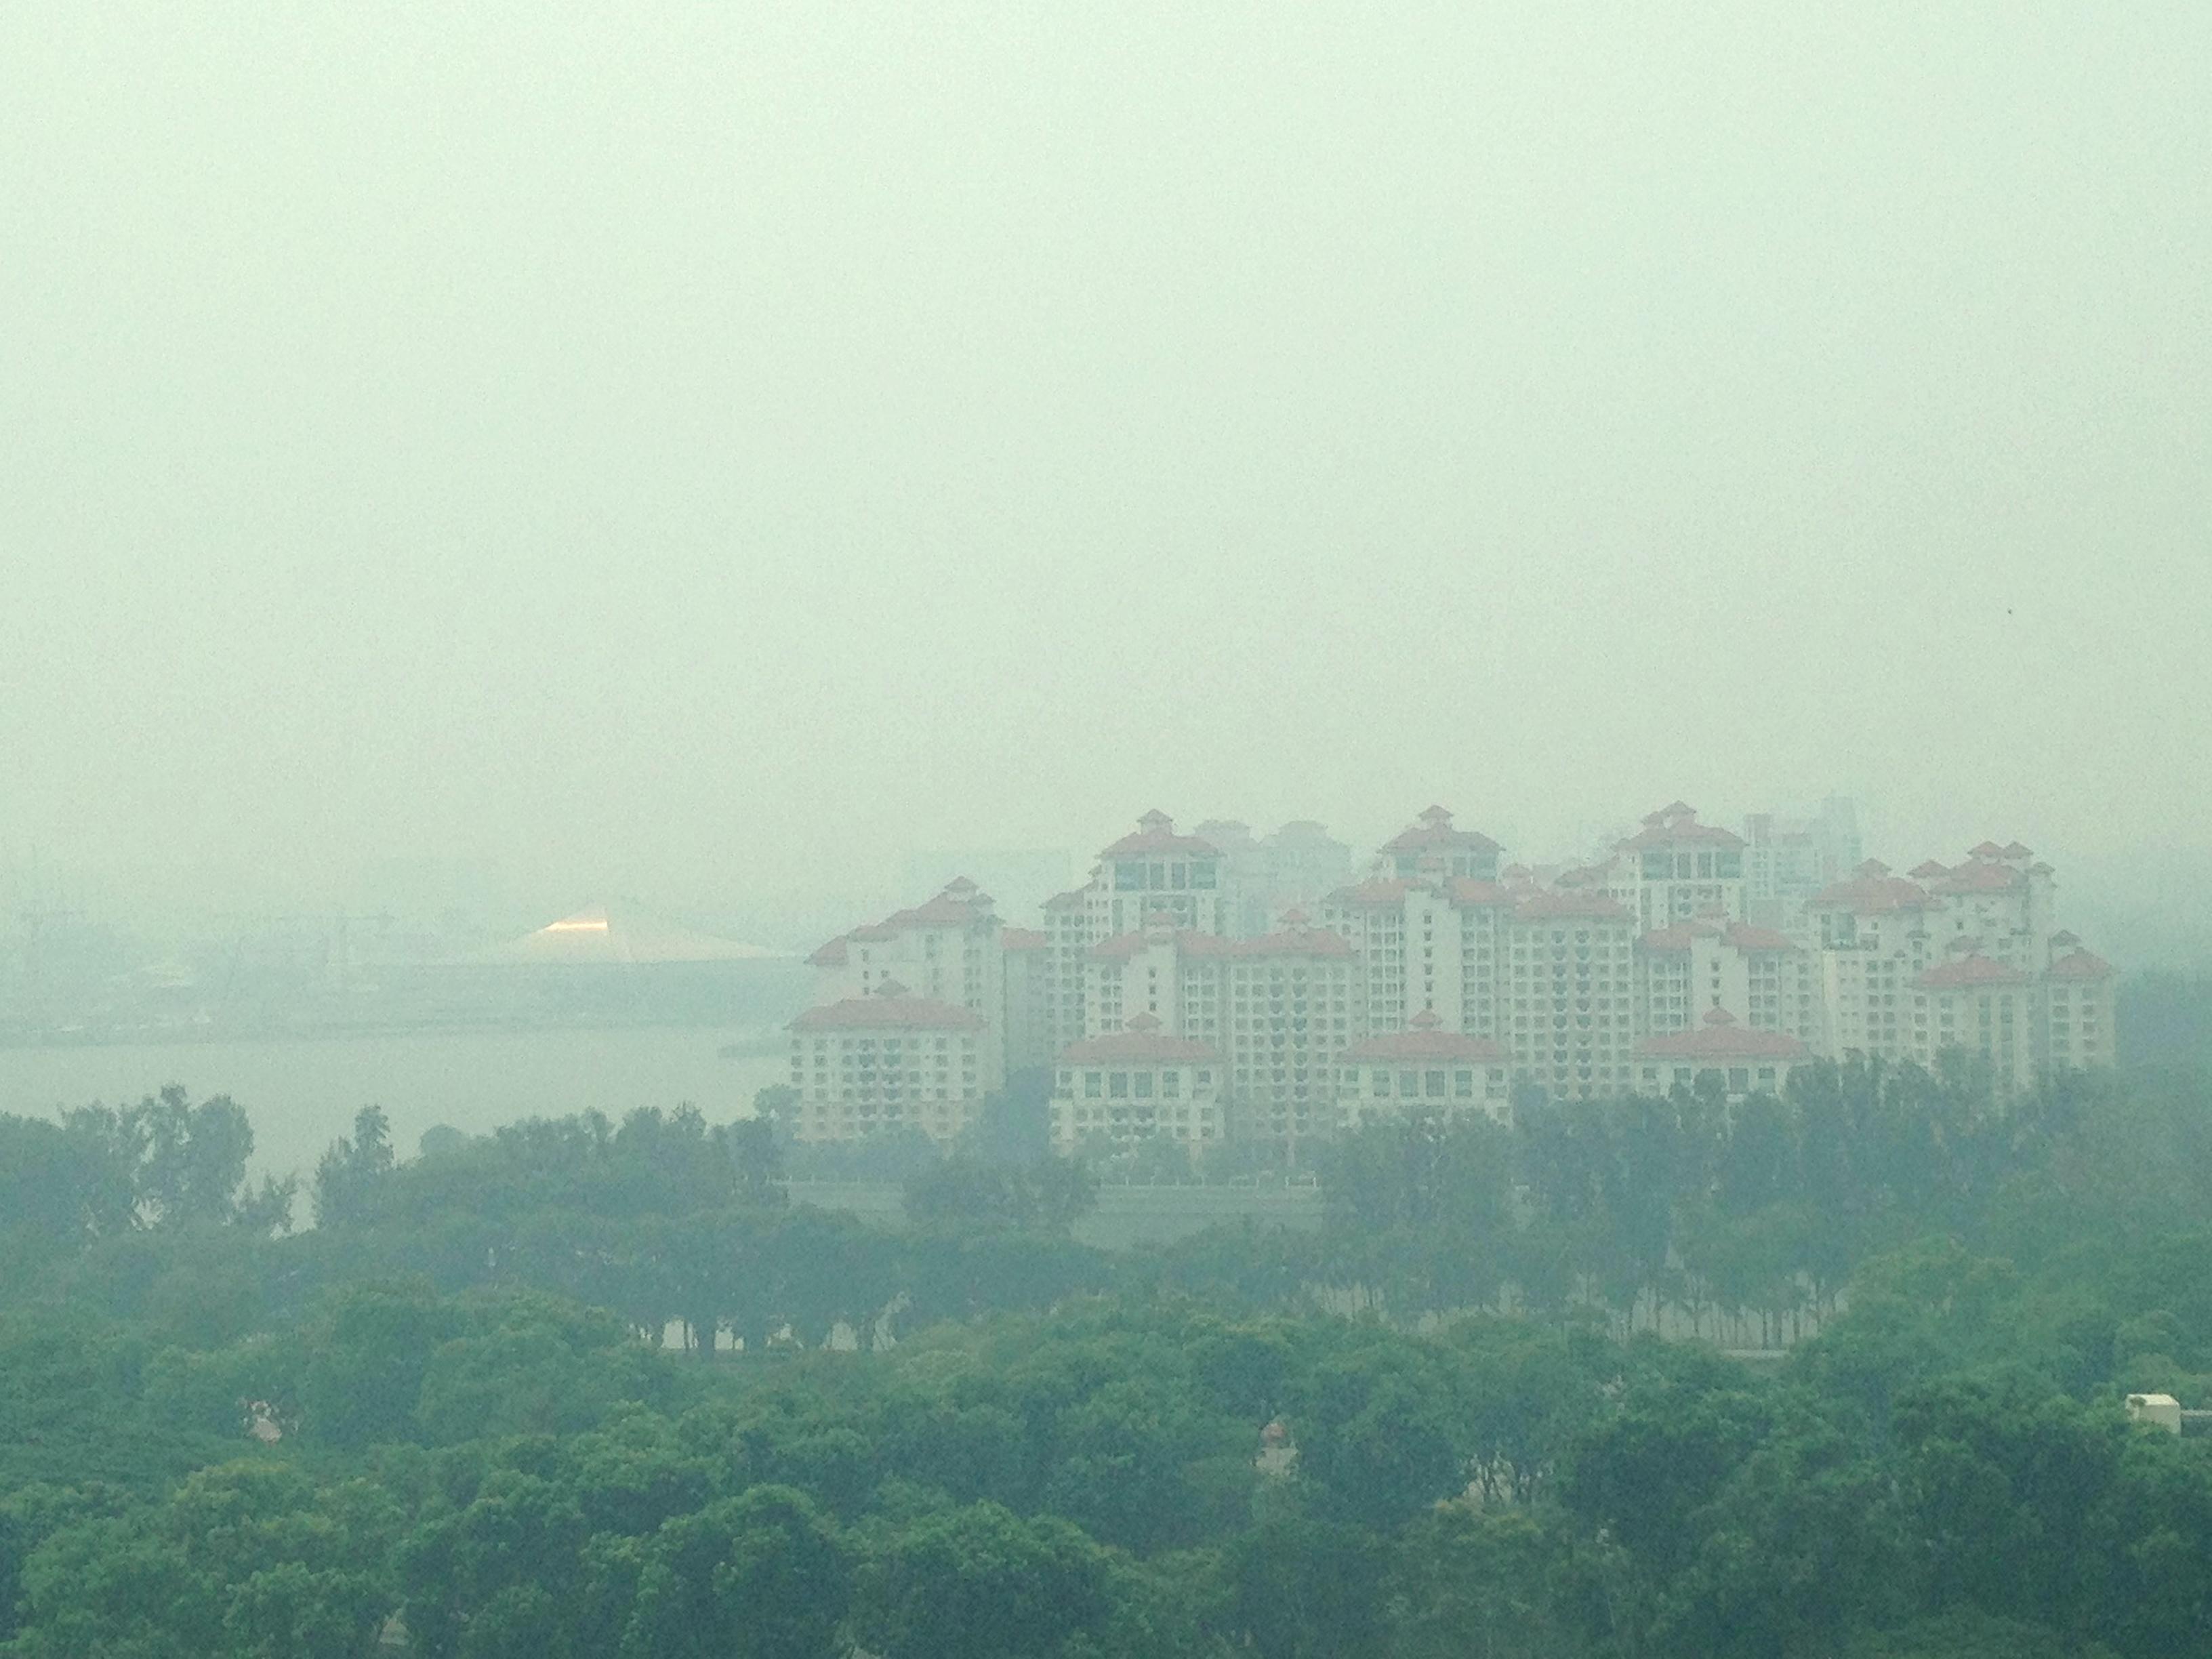 File:Haze in Singapore - 20130617.jpg - Wikimedia Commons